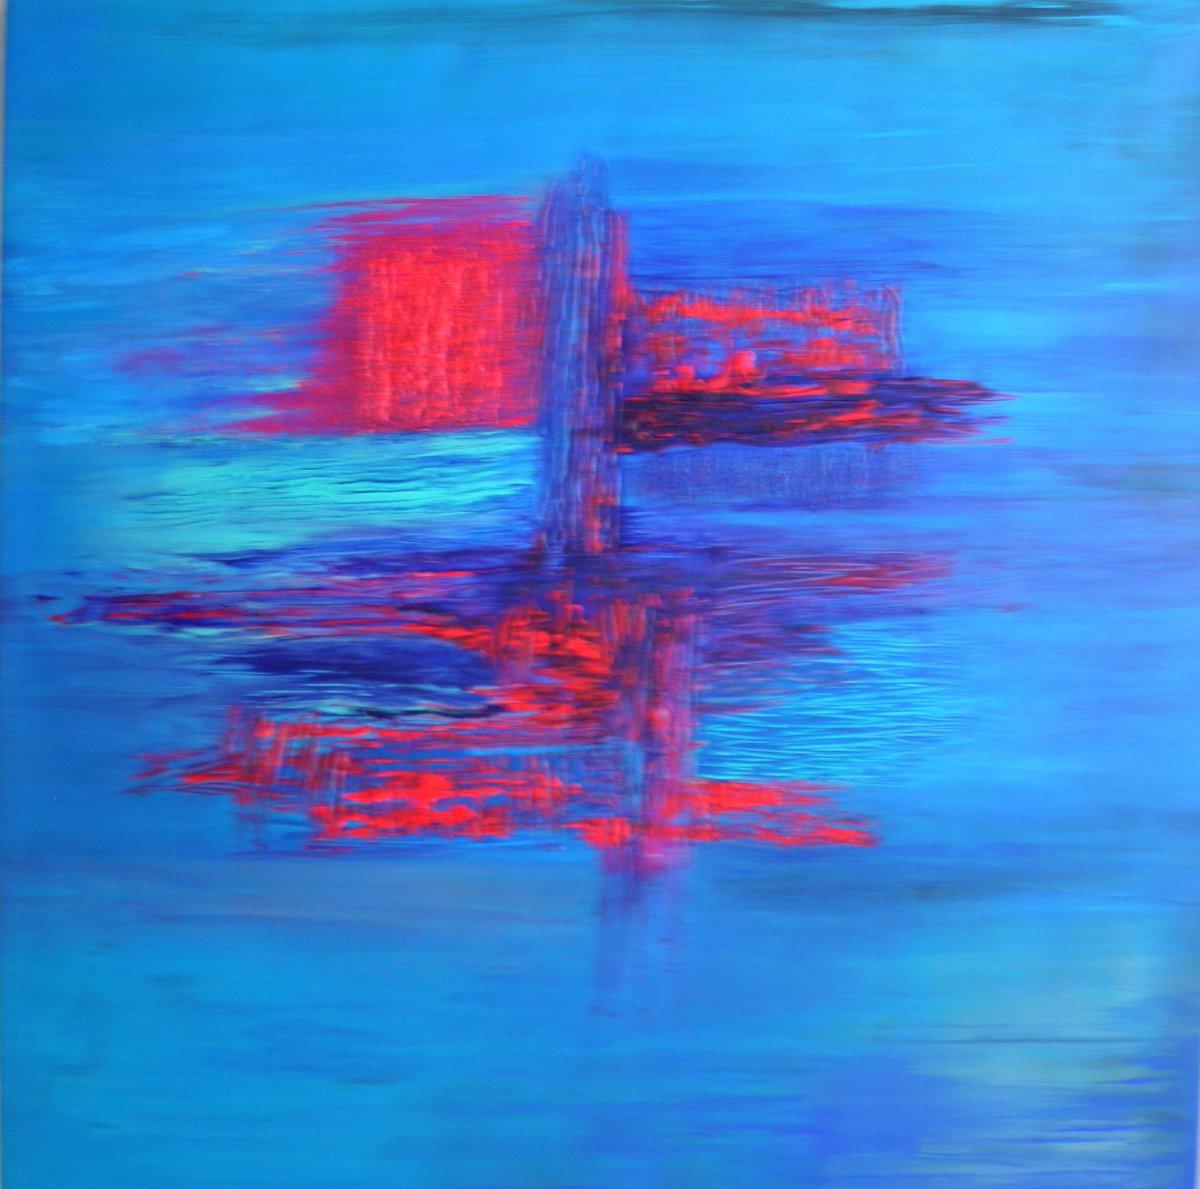 Wind Cross Acrylic/mixed on canvas, 100/100cm #ArtistOnTwitter #artshare #artforsale #artgisela #myartwork #LikeMe #FolloMe #womenLinkedINNC  #energy #saatchiartpic.twitter.com/EdwFhof8vu